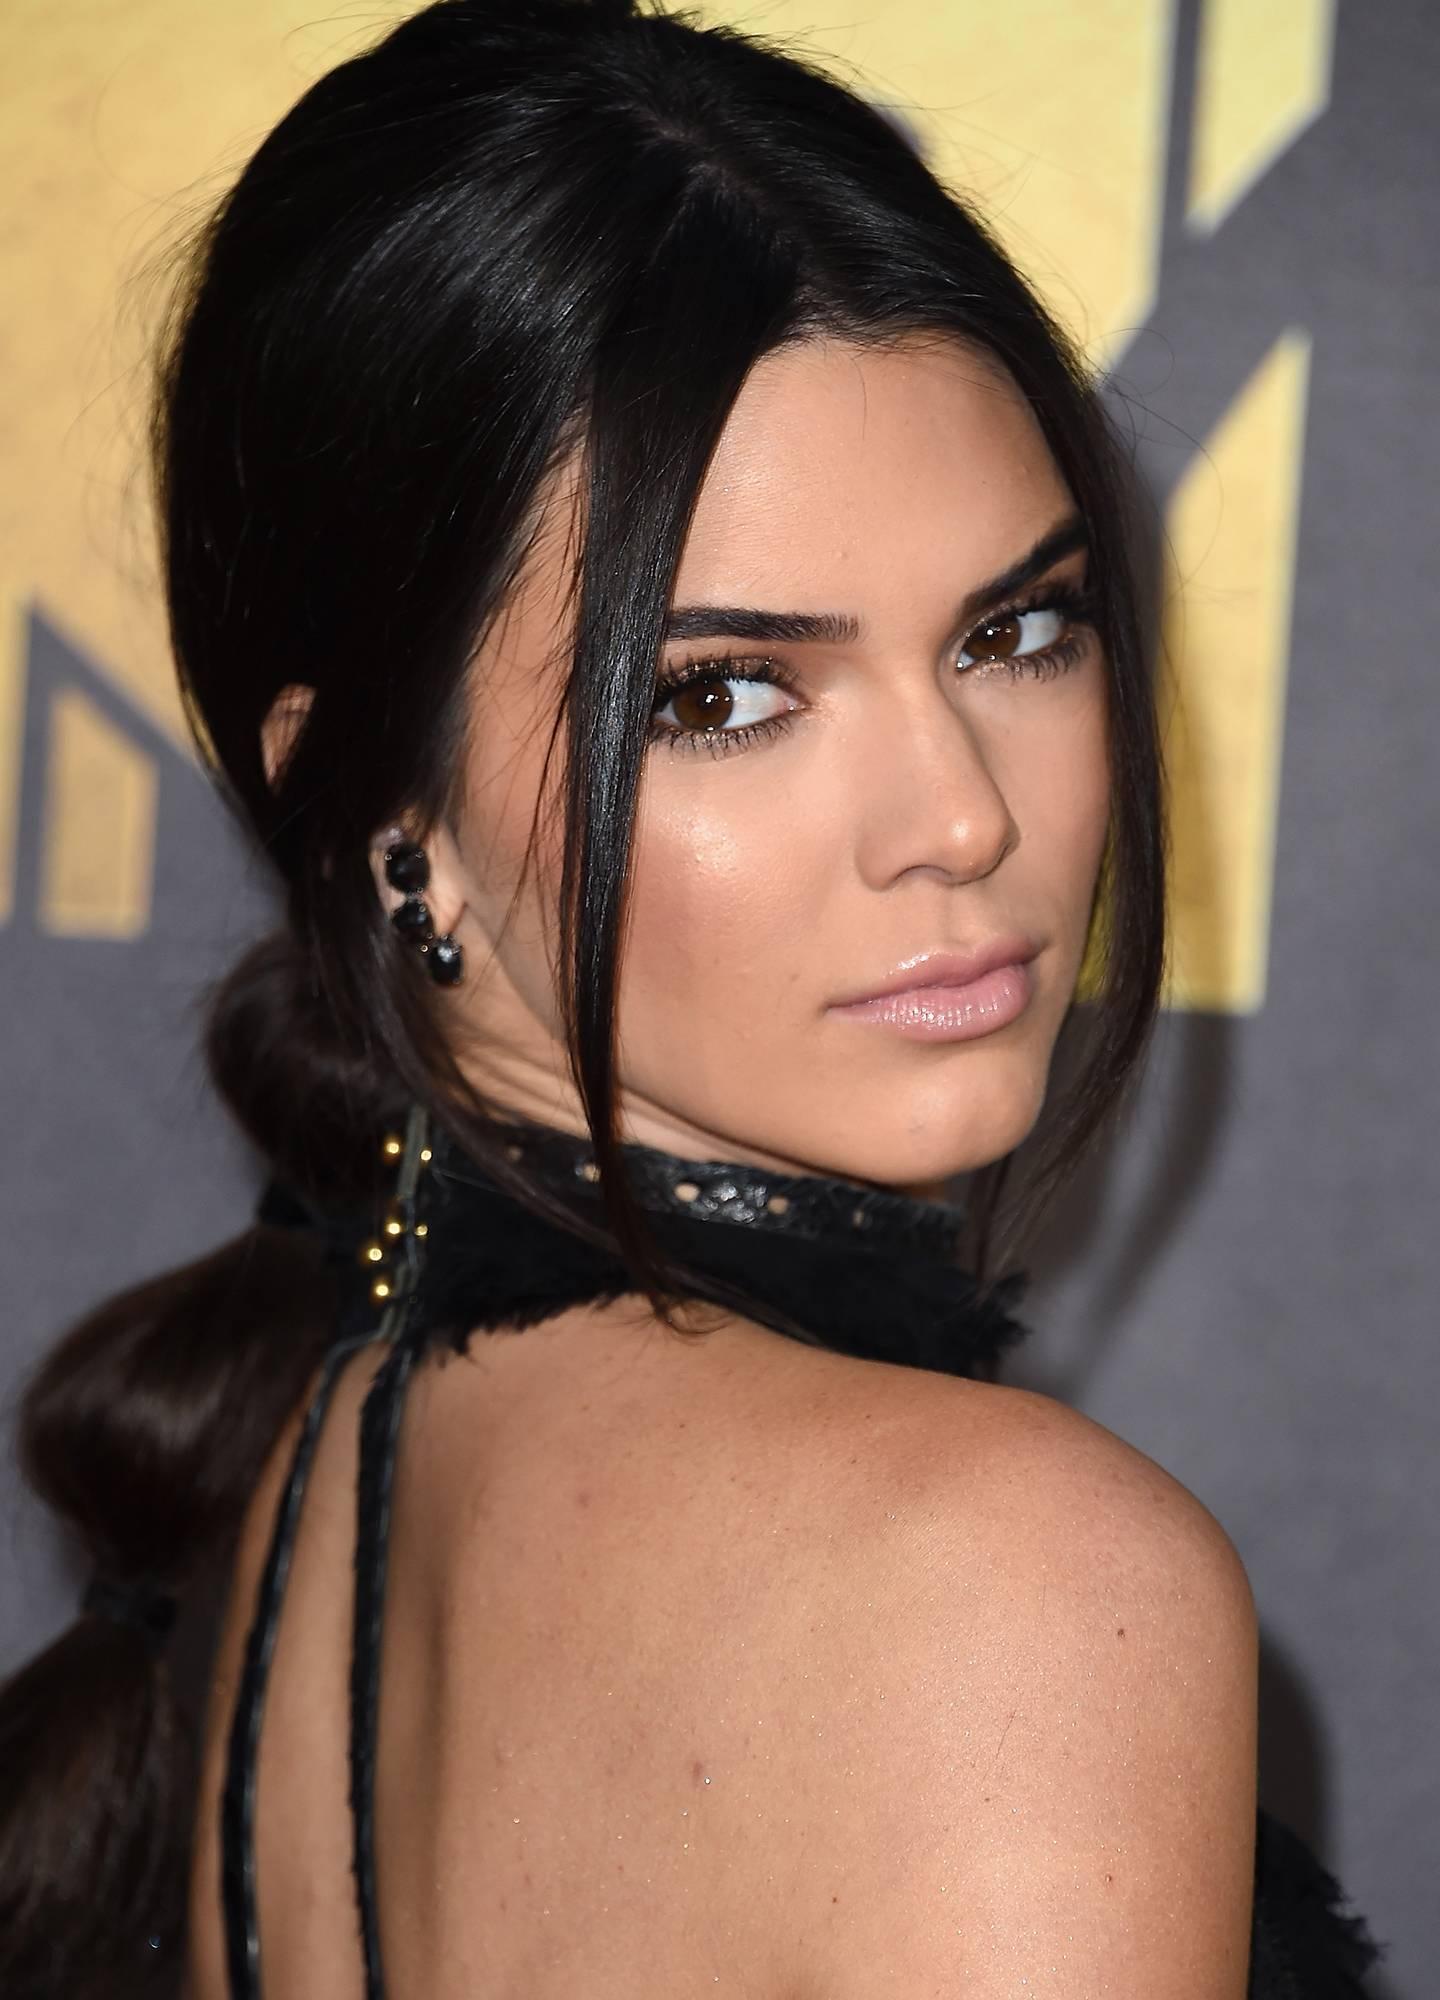 mgid:file:gsp:scenic:/international/mtvla.com-new/shows/movie-awards/redcarpet/Kendall-Jenner---Getty-2.jpg